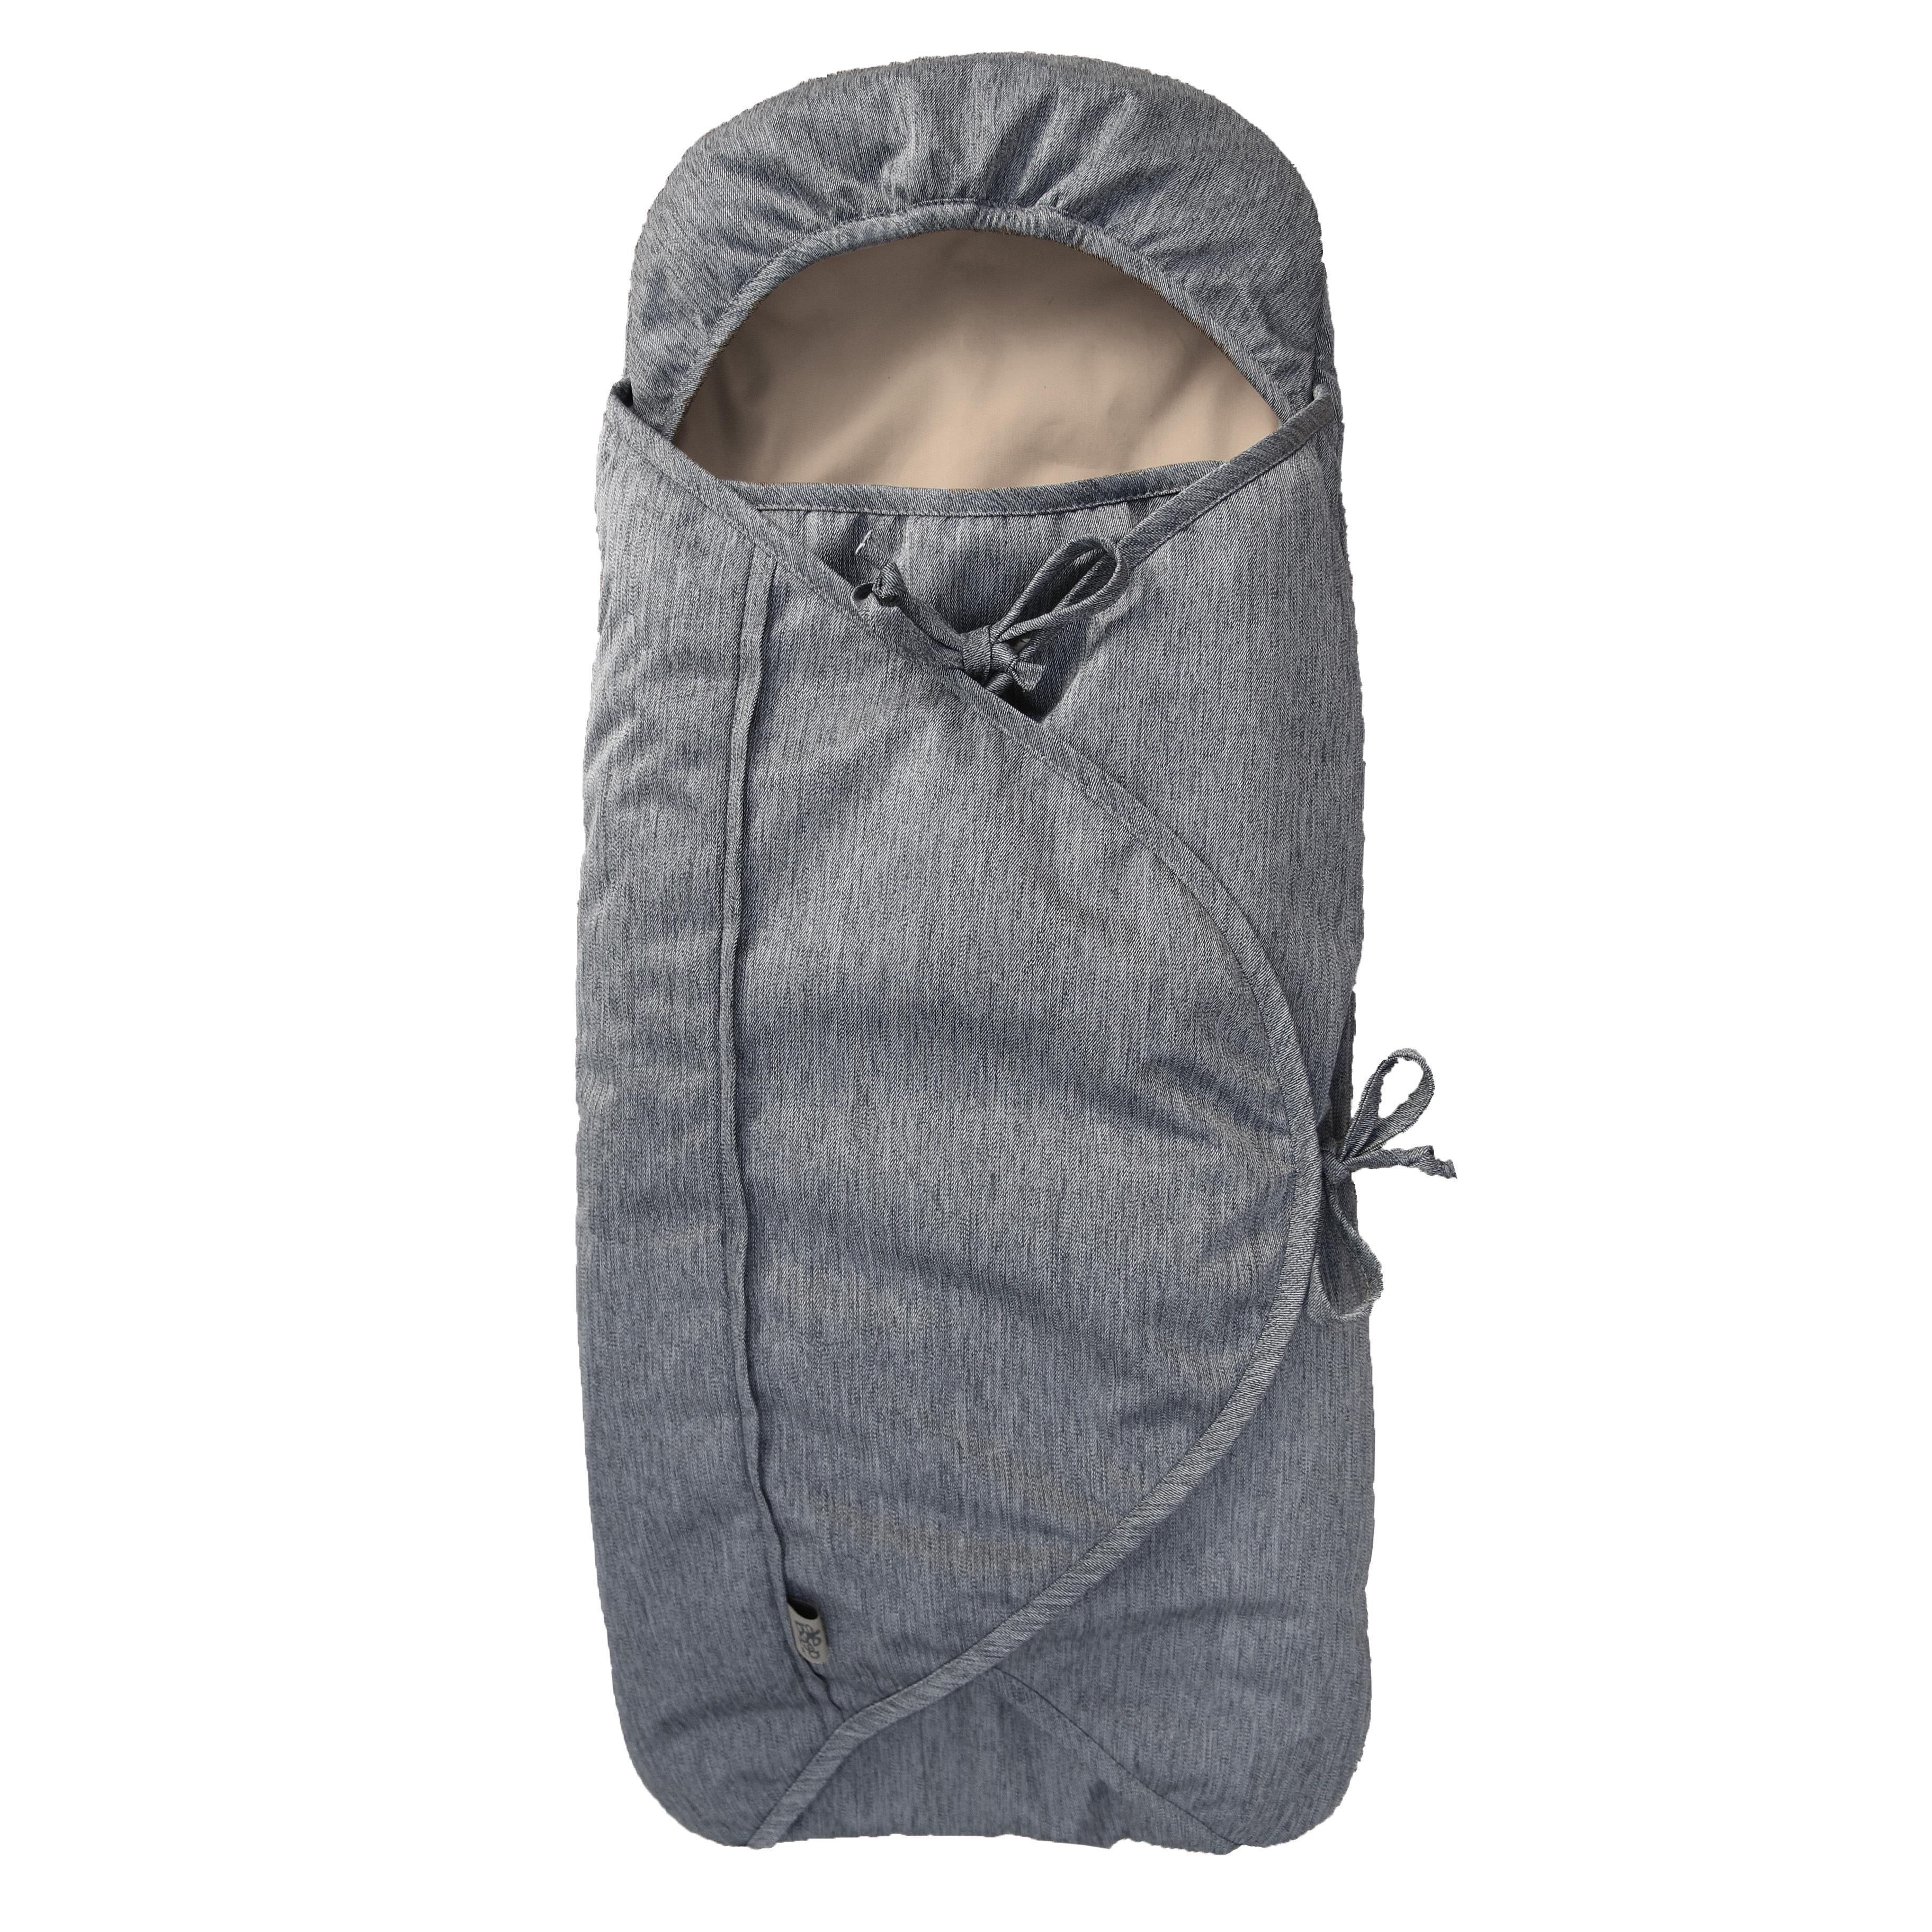 Image of   Sleepbag kørepose til autostolen - Bycar - Grå/brun